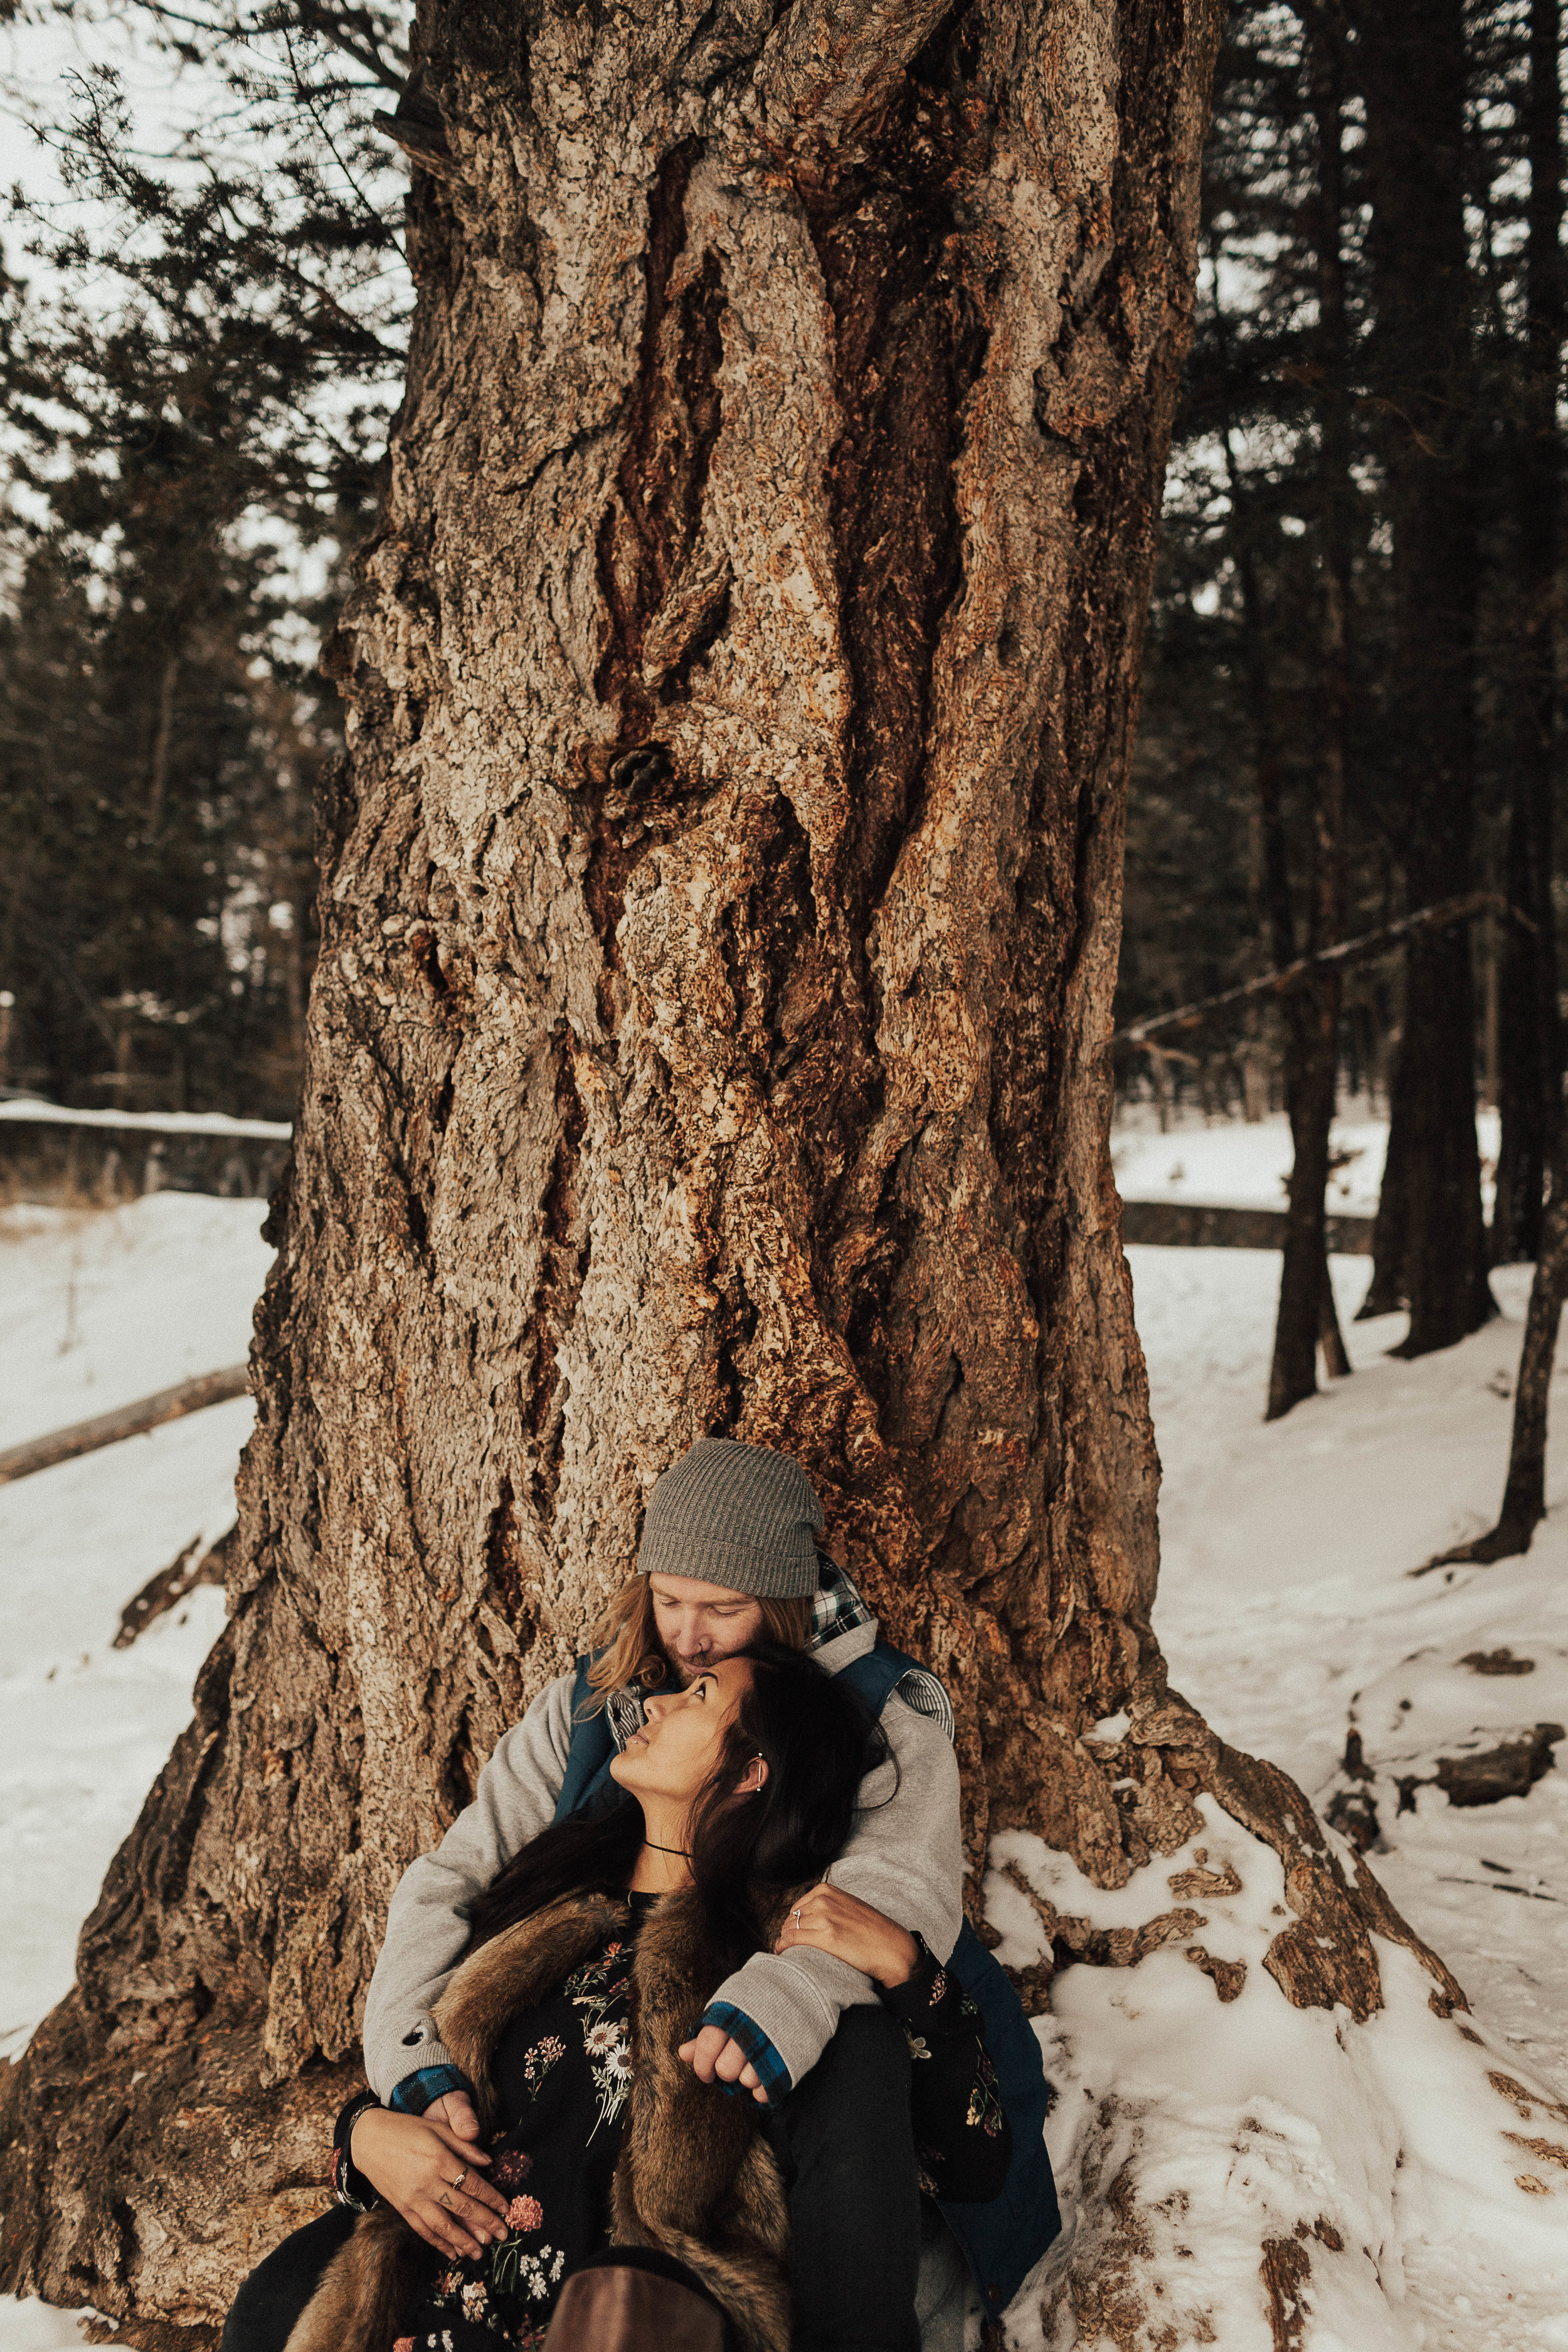 Banff Engagement Photographer - Winter Mountain Adventure Engagement Session - Michelle Larmand Photography-063